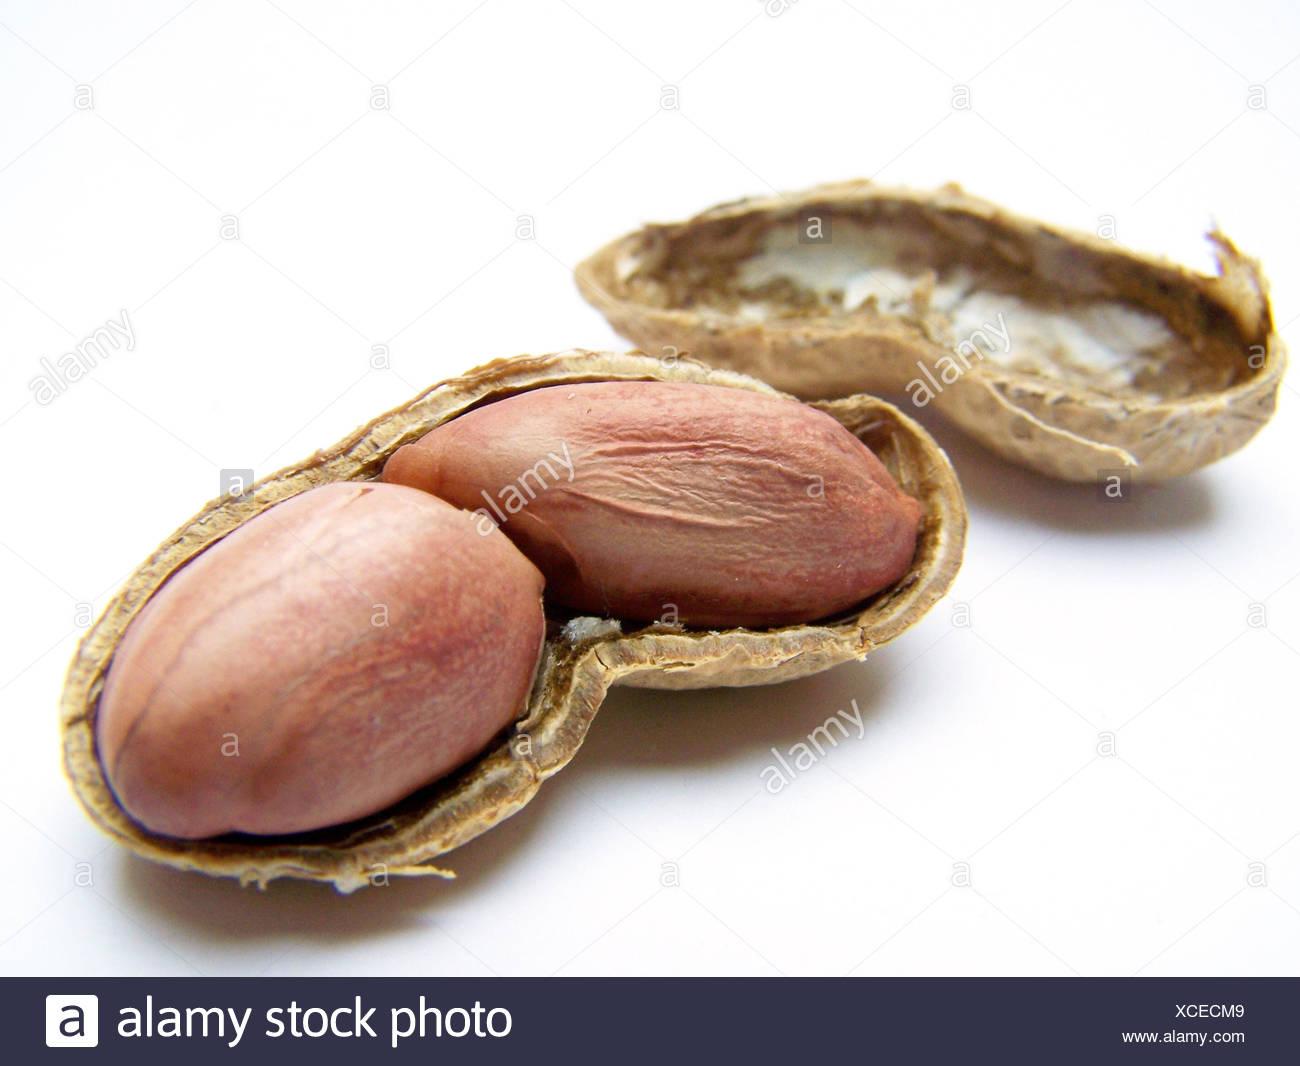 food aliment peanuts bowl crack calories oxidized legume containing fat - Stock Image